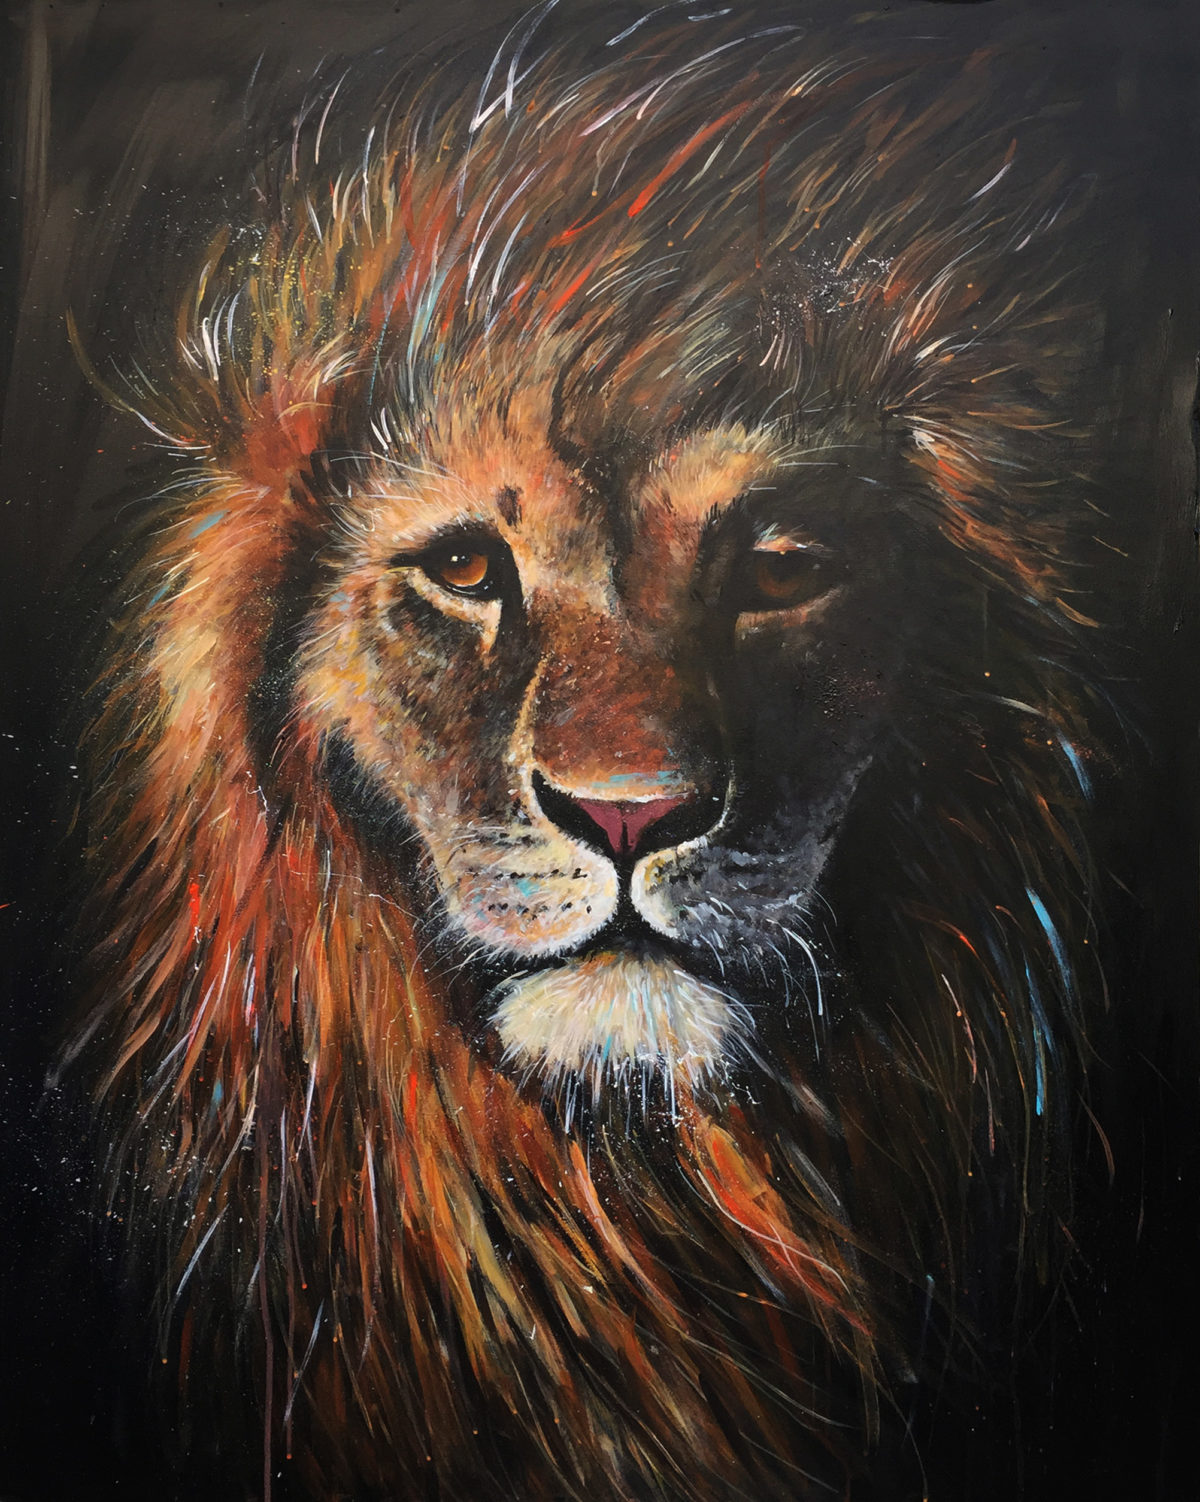 Lion by Artist Ewen Macaulay